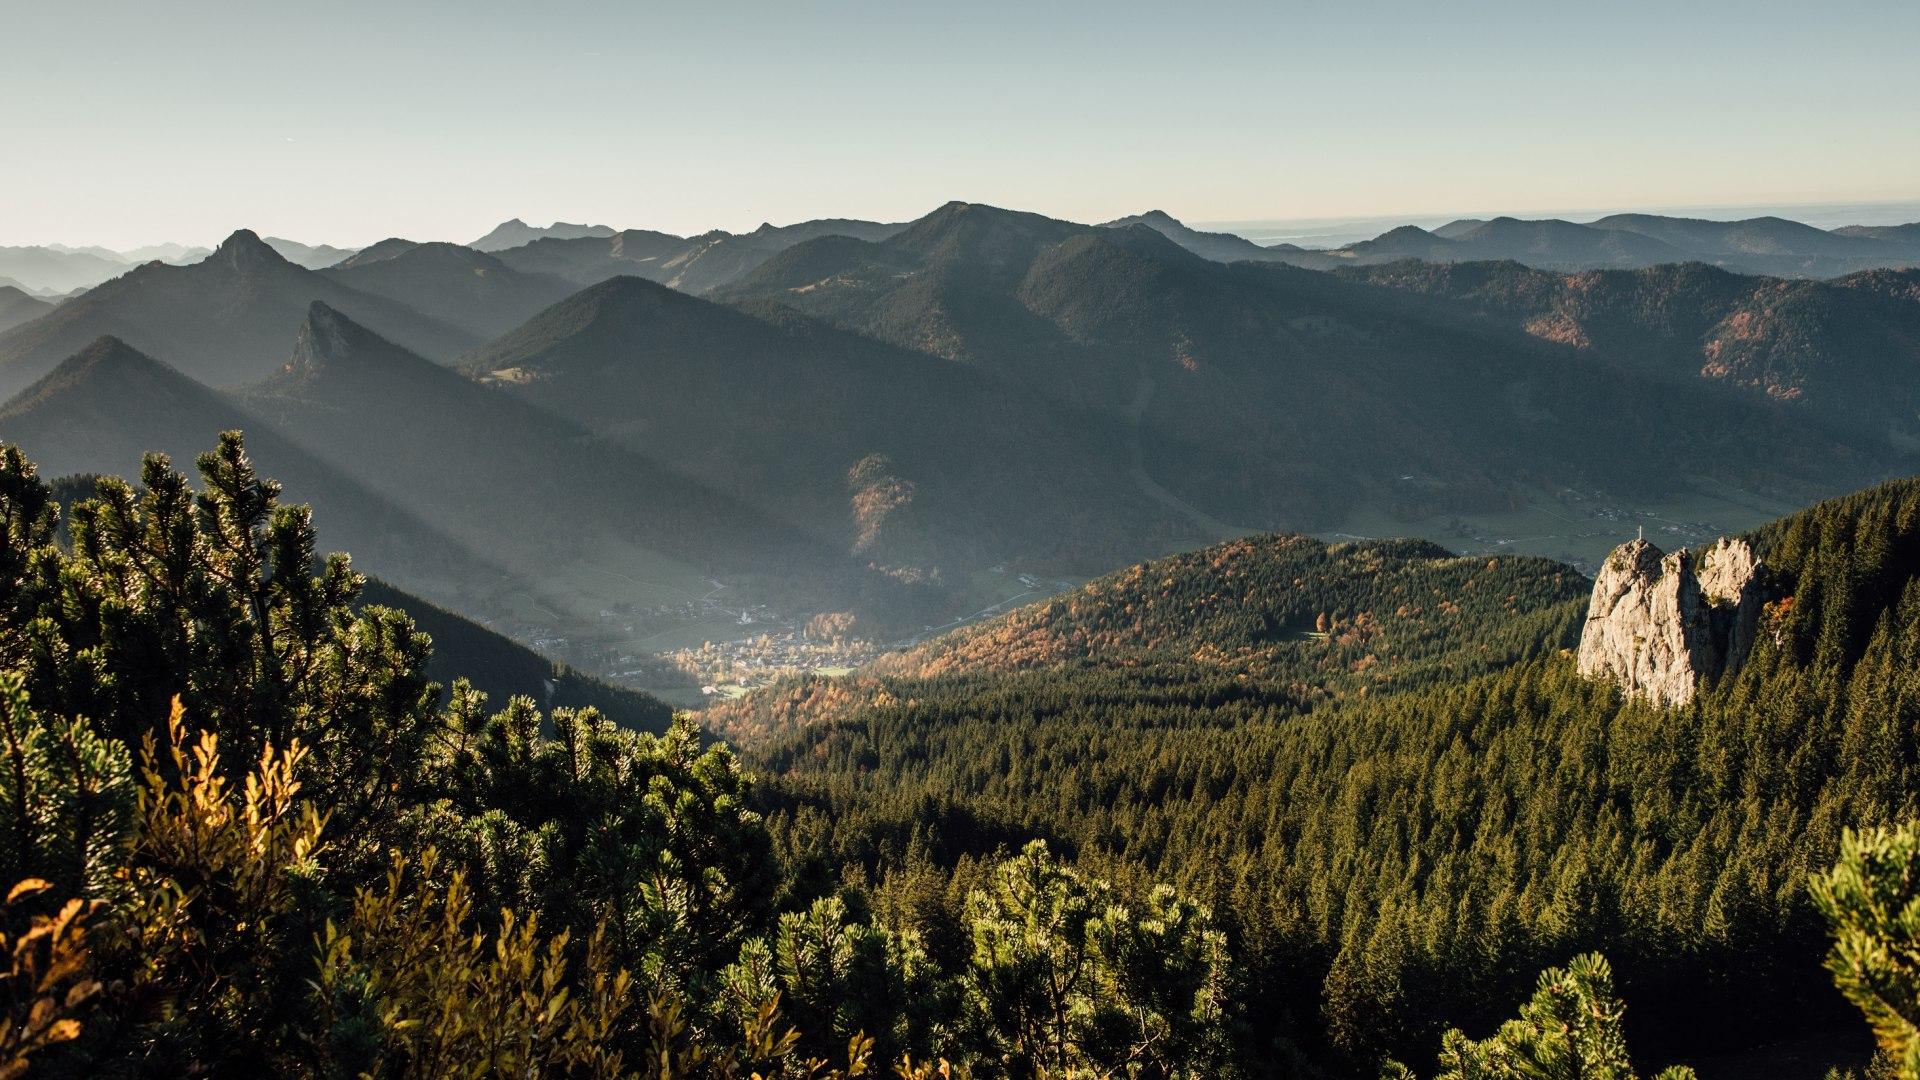 Berge, © Der Tegernsee, Julian Rohn